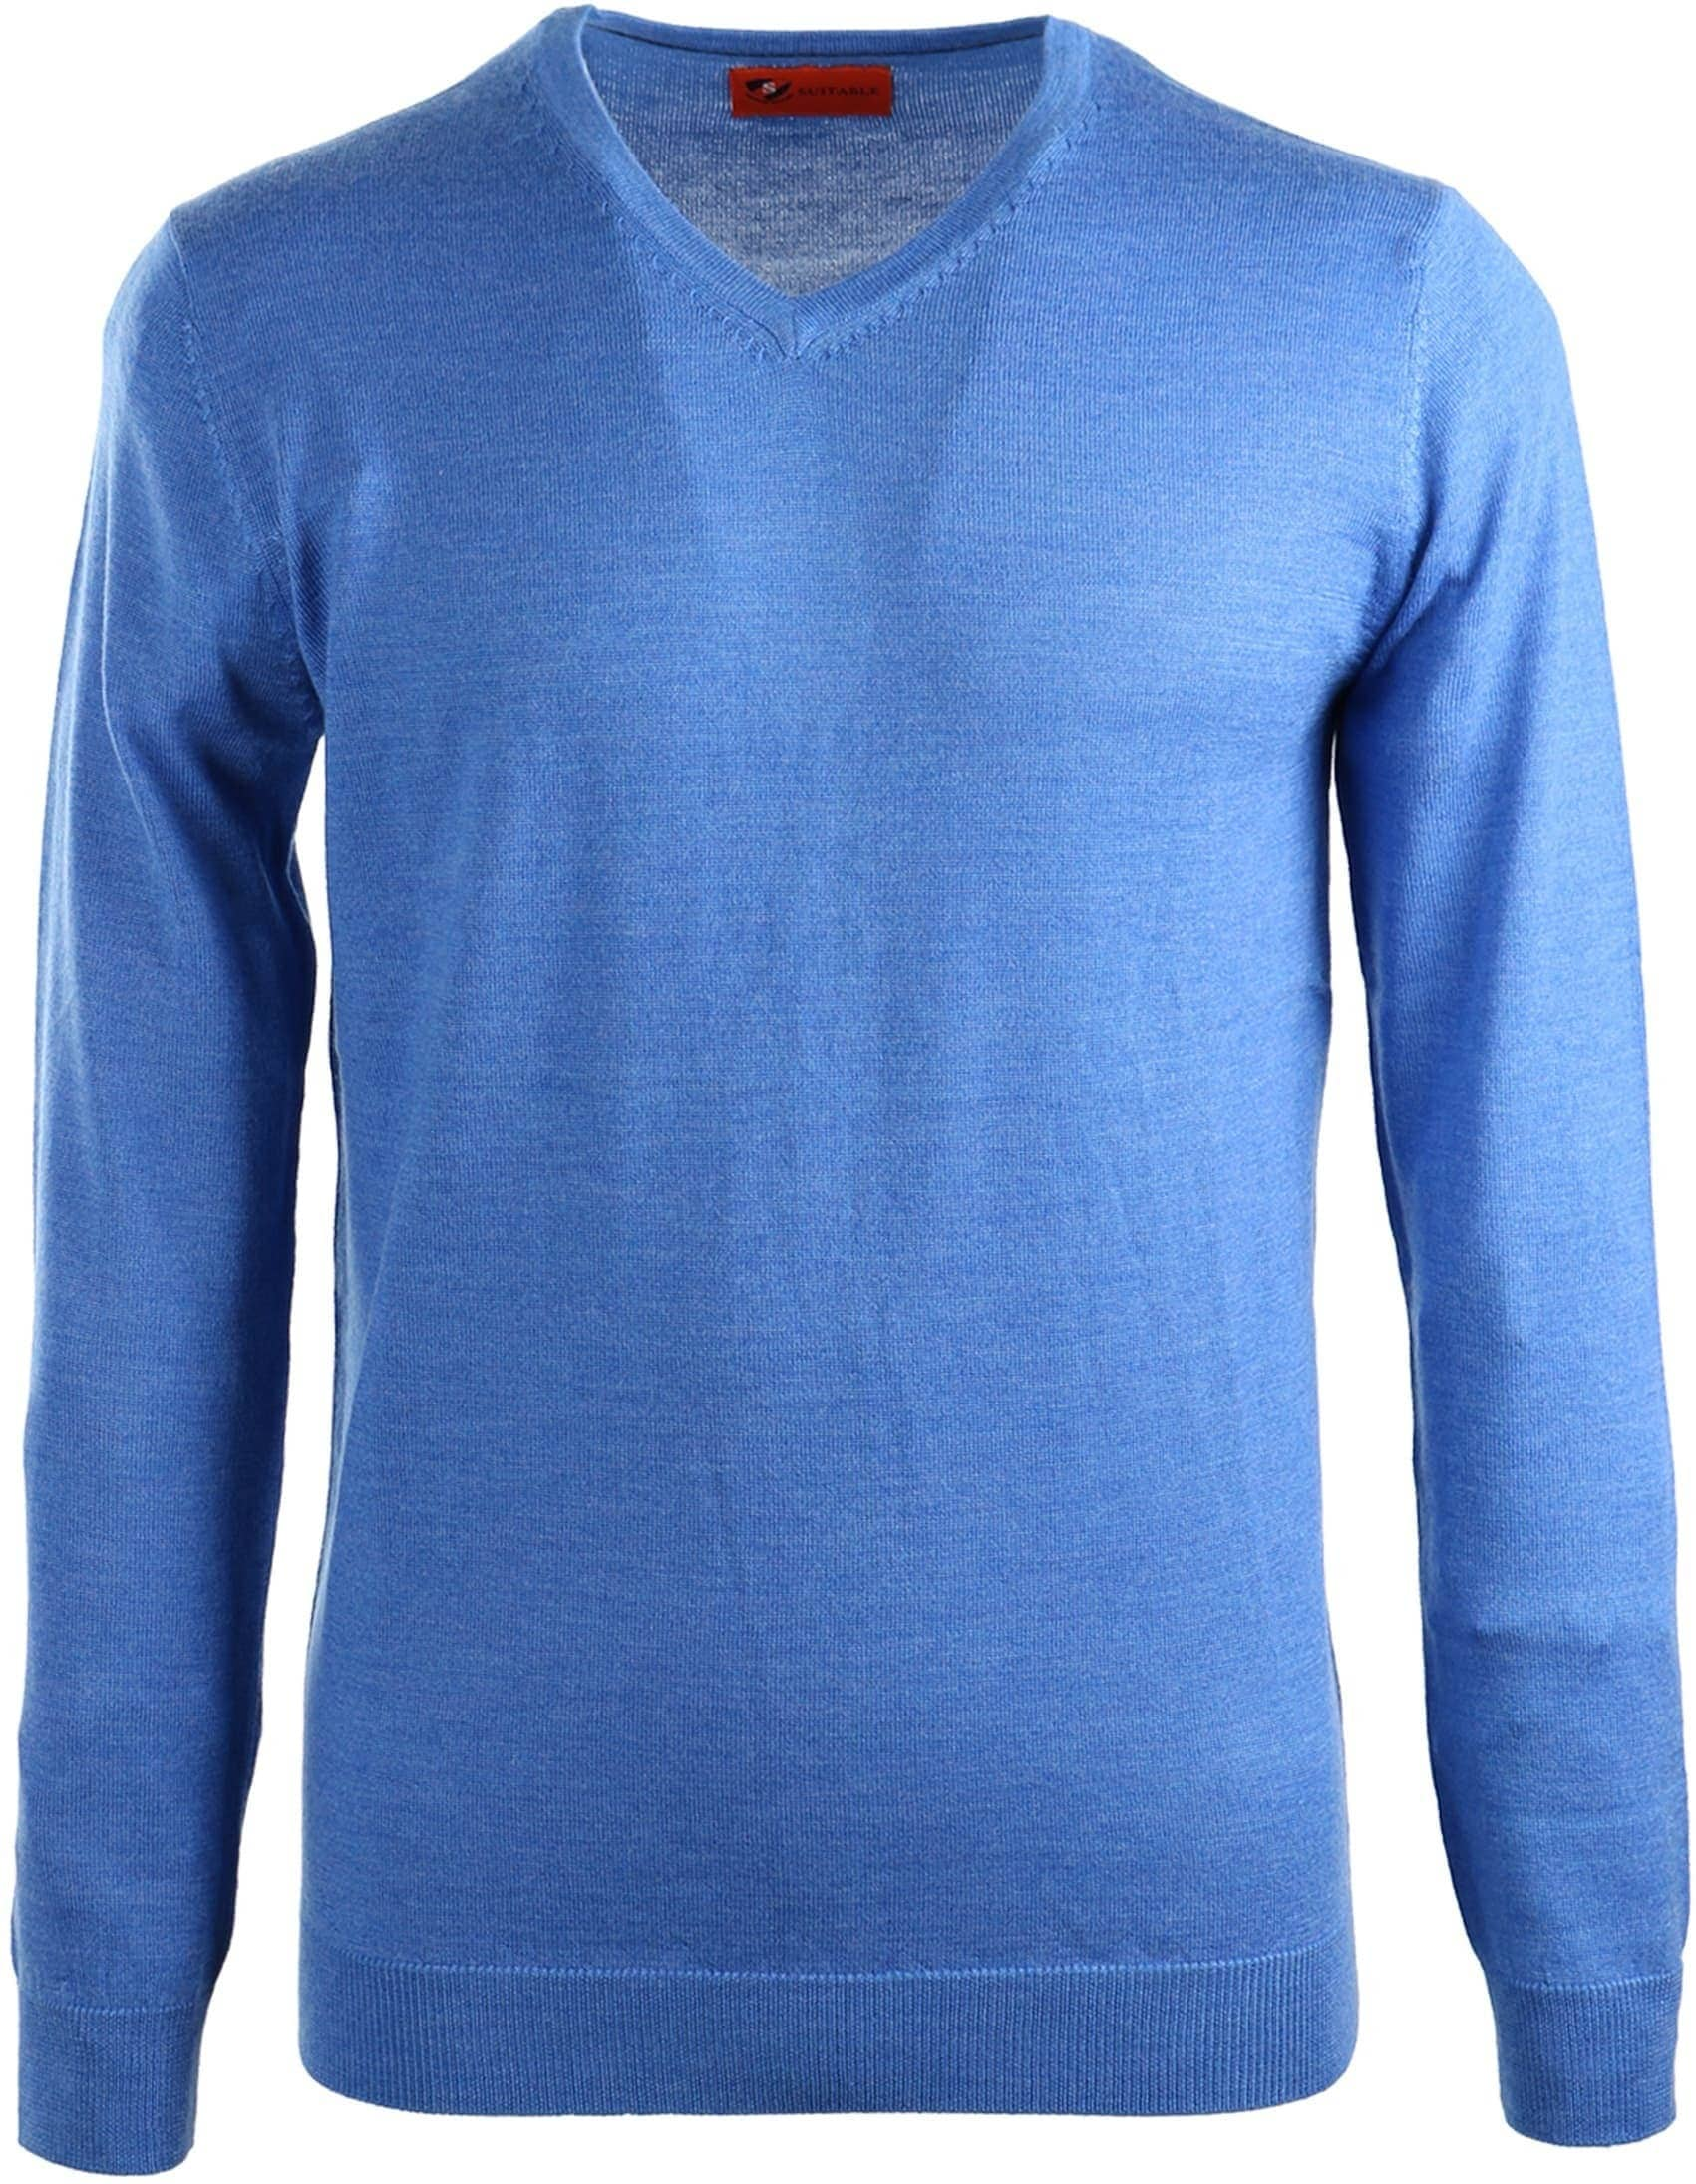 Suitable Merino Wool Pullover Blue foto 0